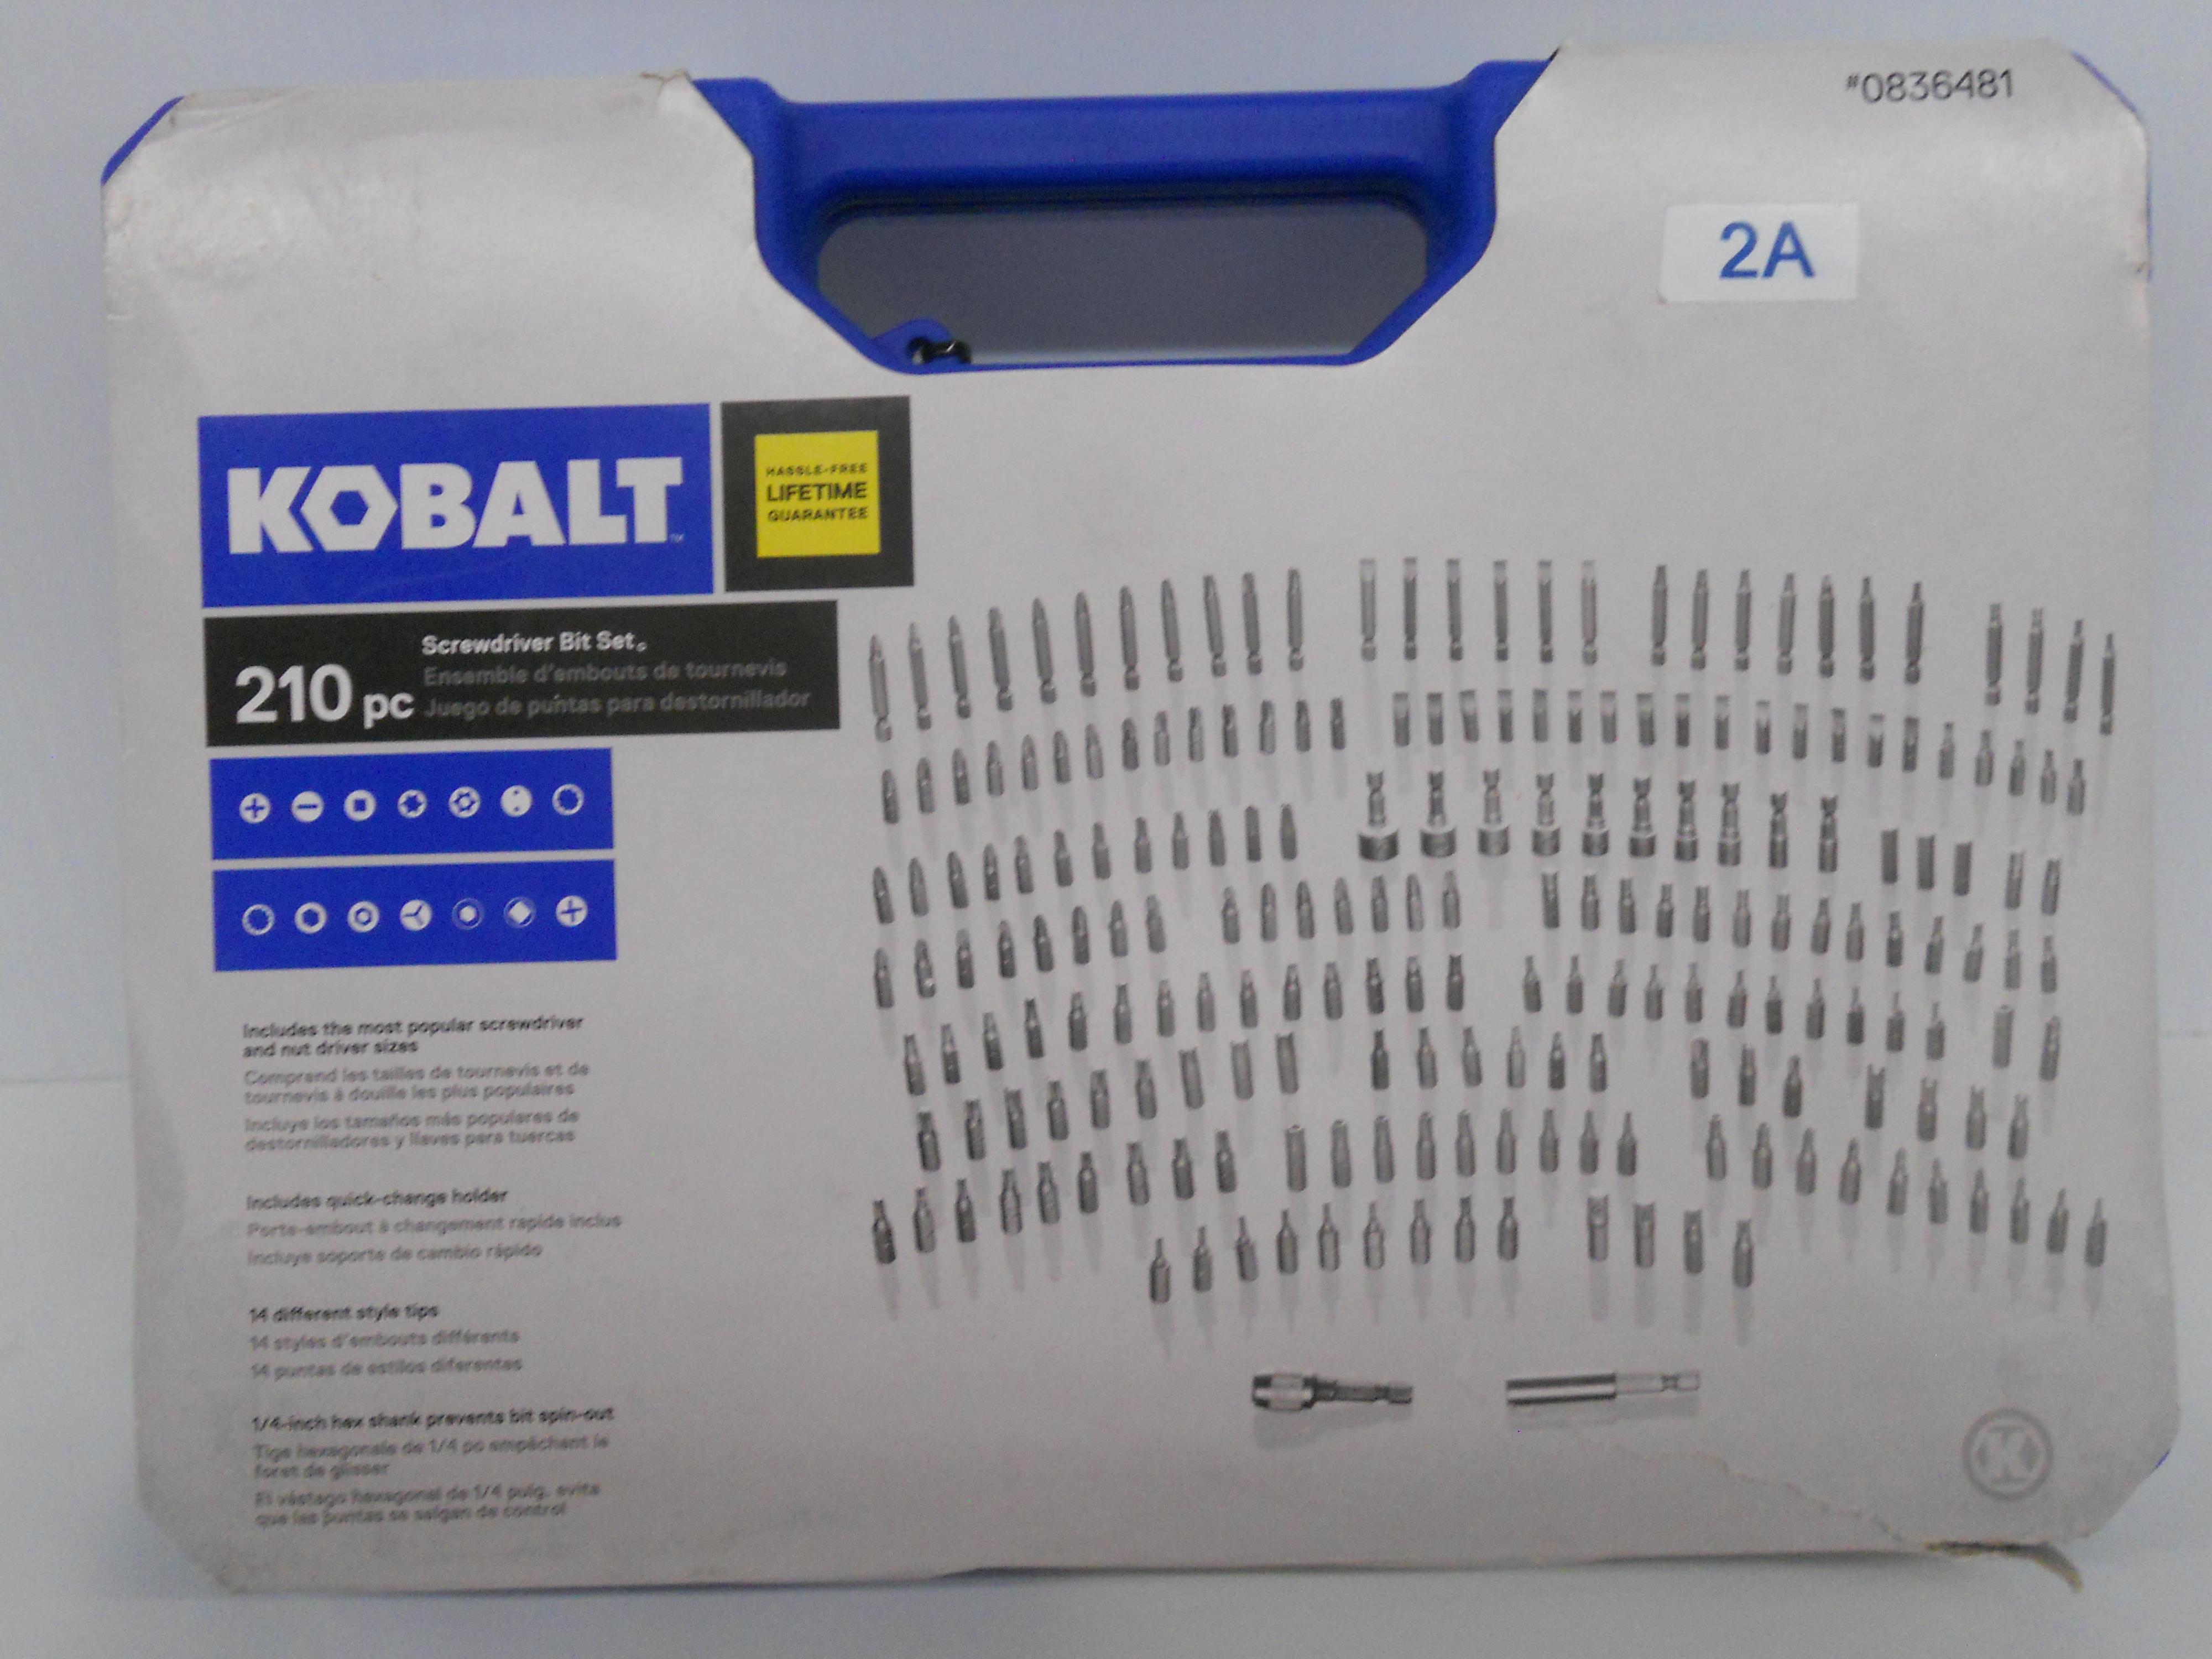 Kobalt 210-piece Screwdriver Bit Set